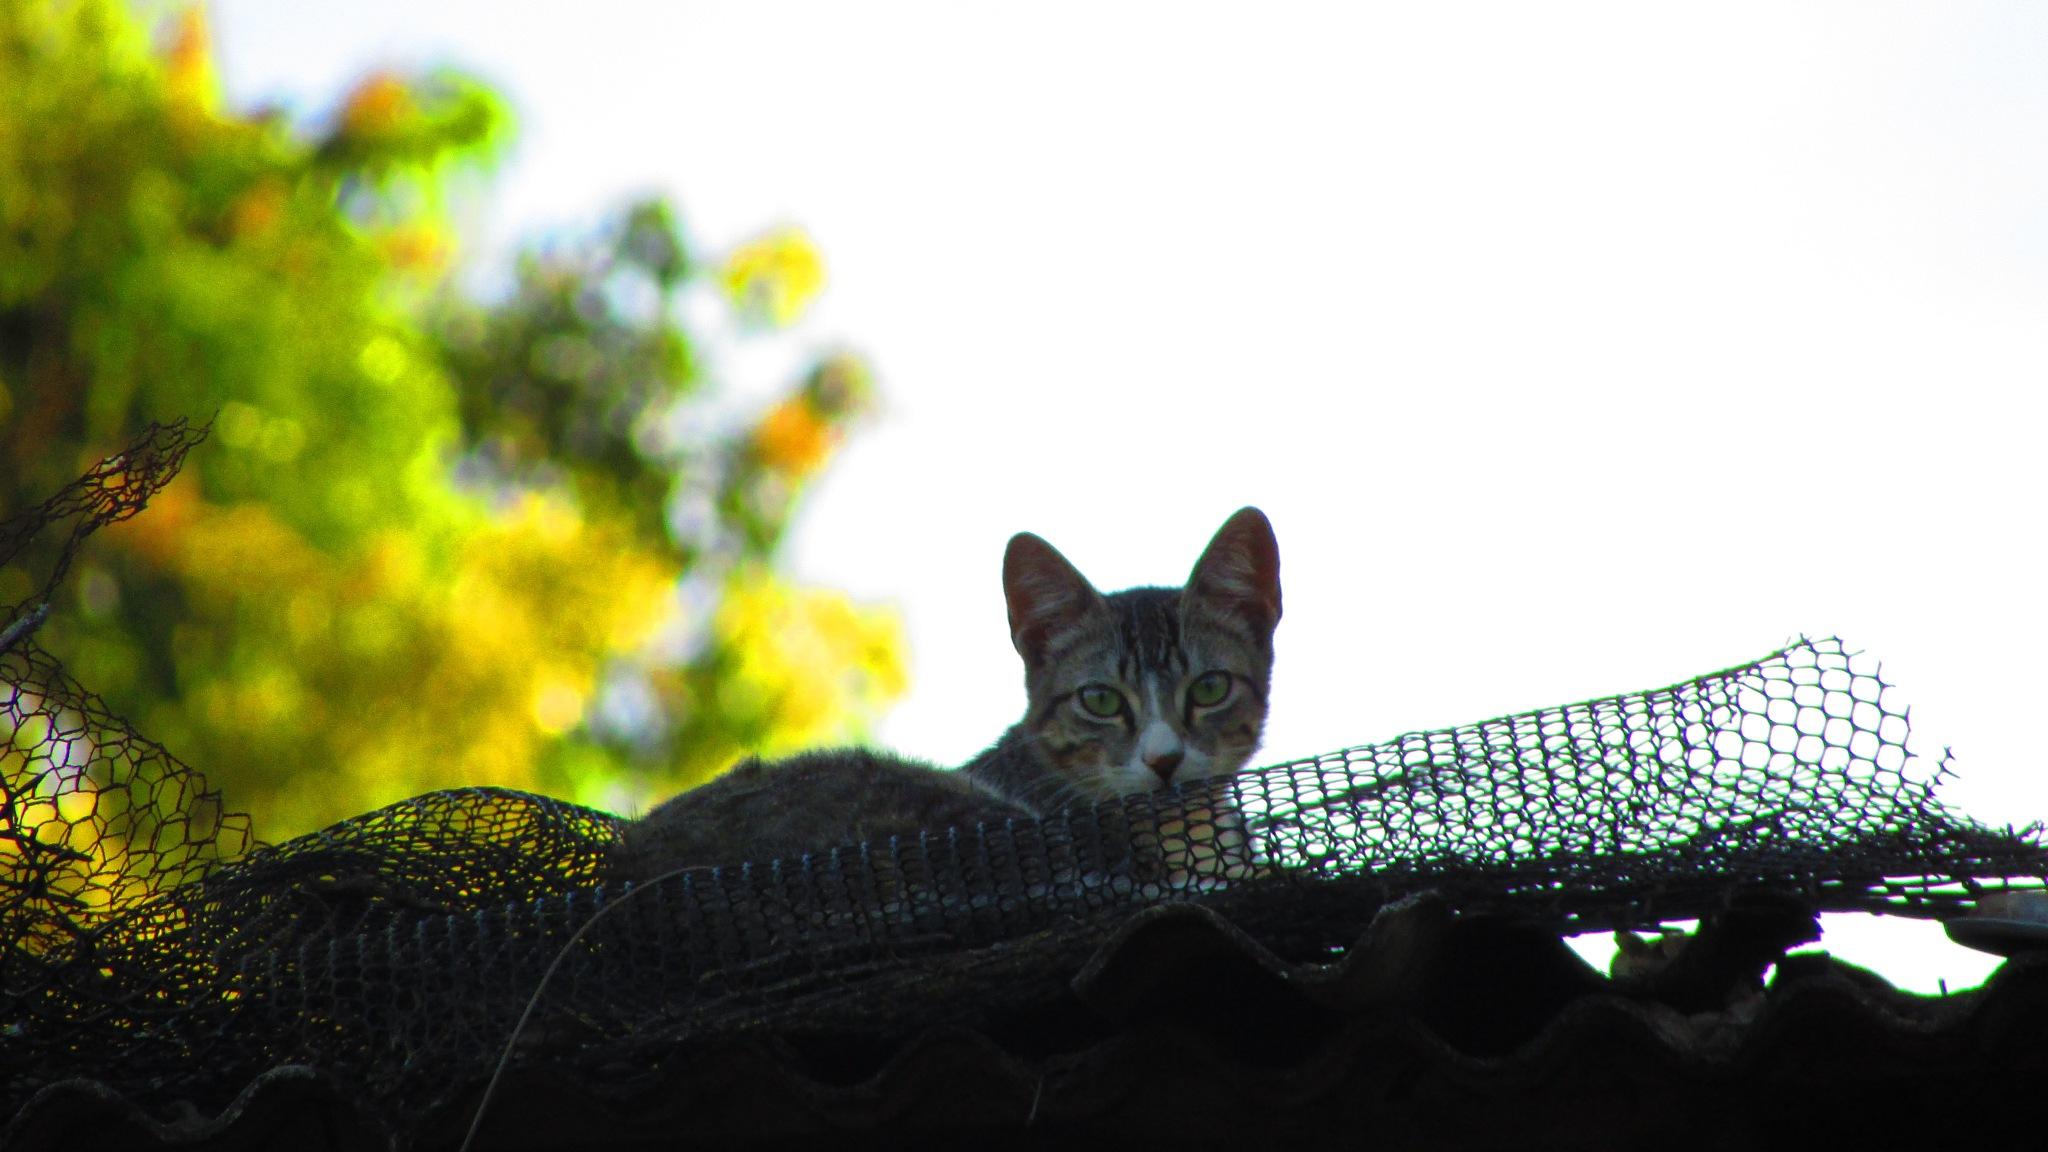 Cat by railanderguilherme